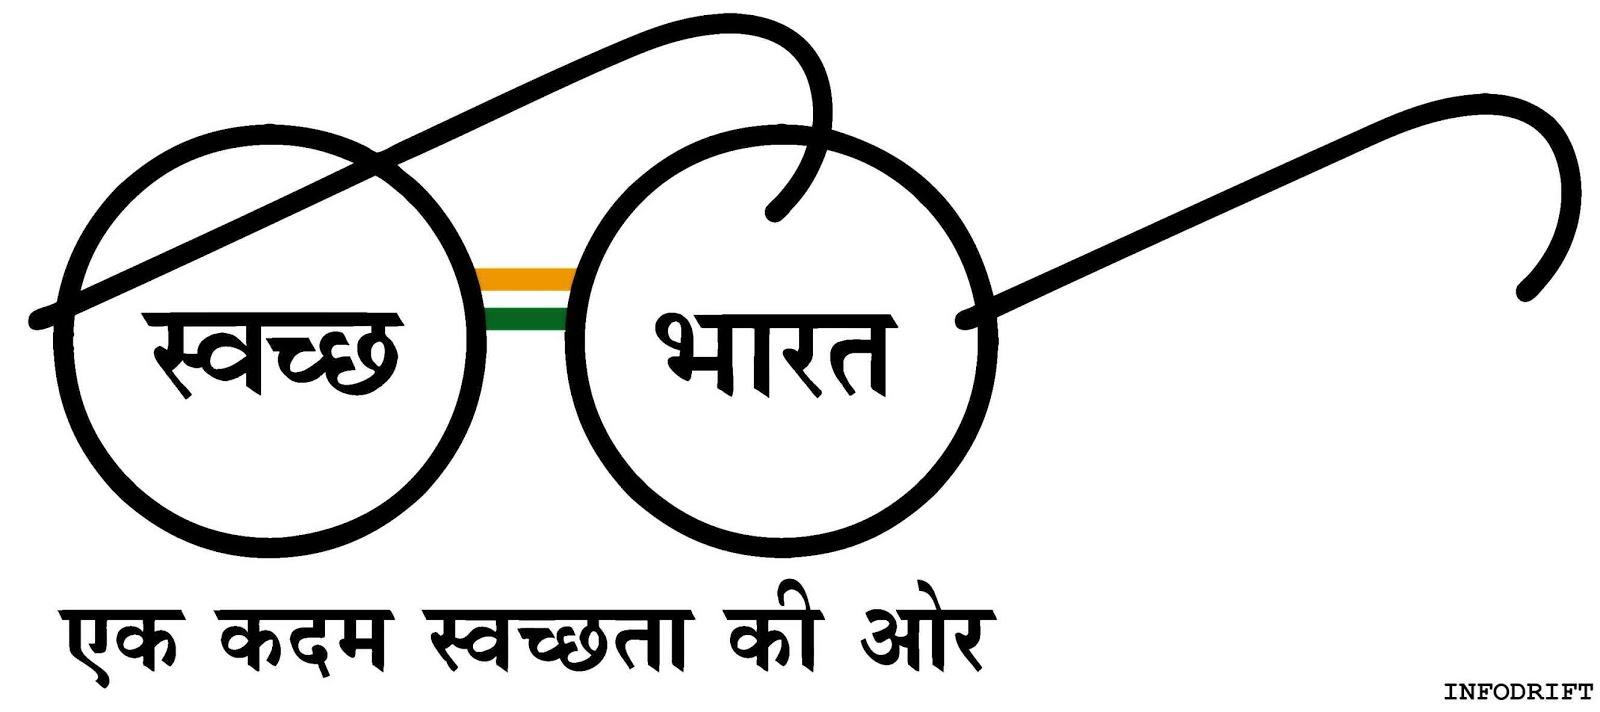 Swatchh Bharat mission